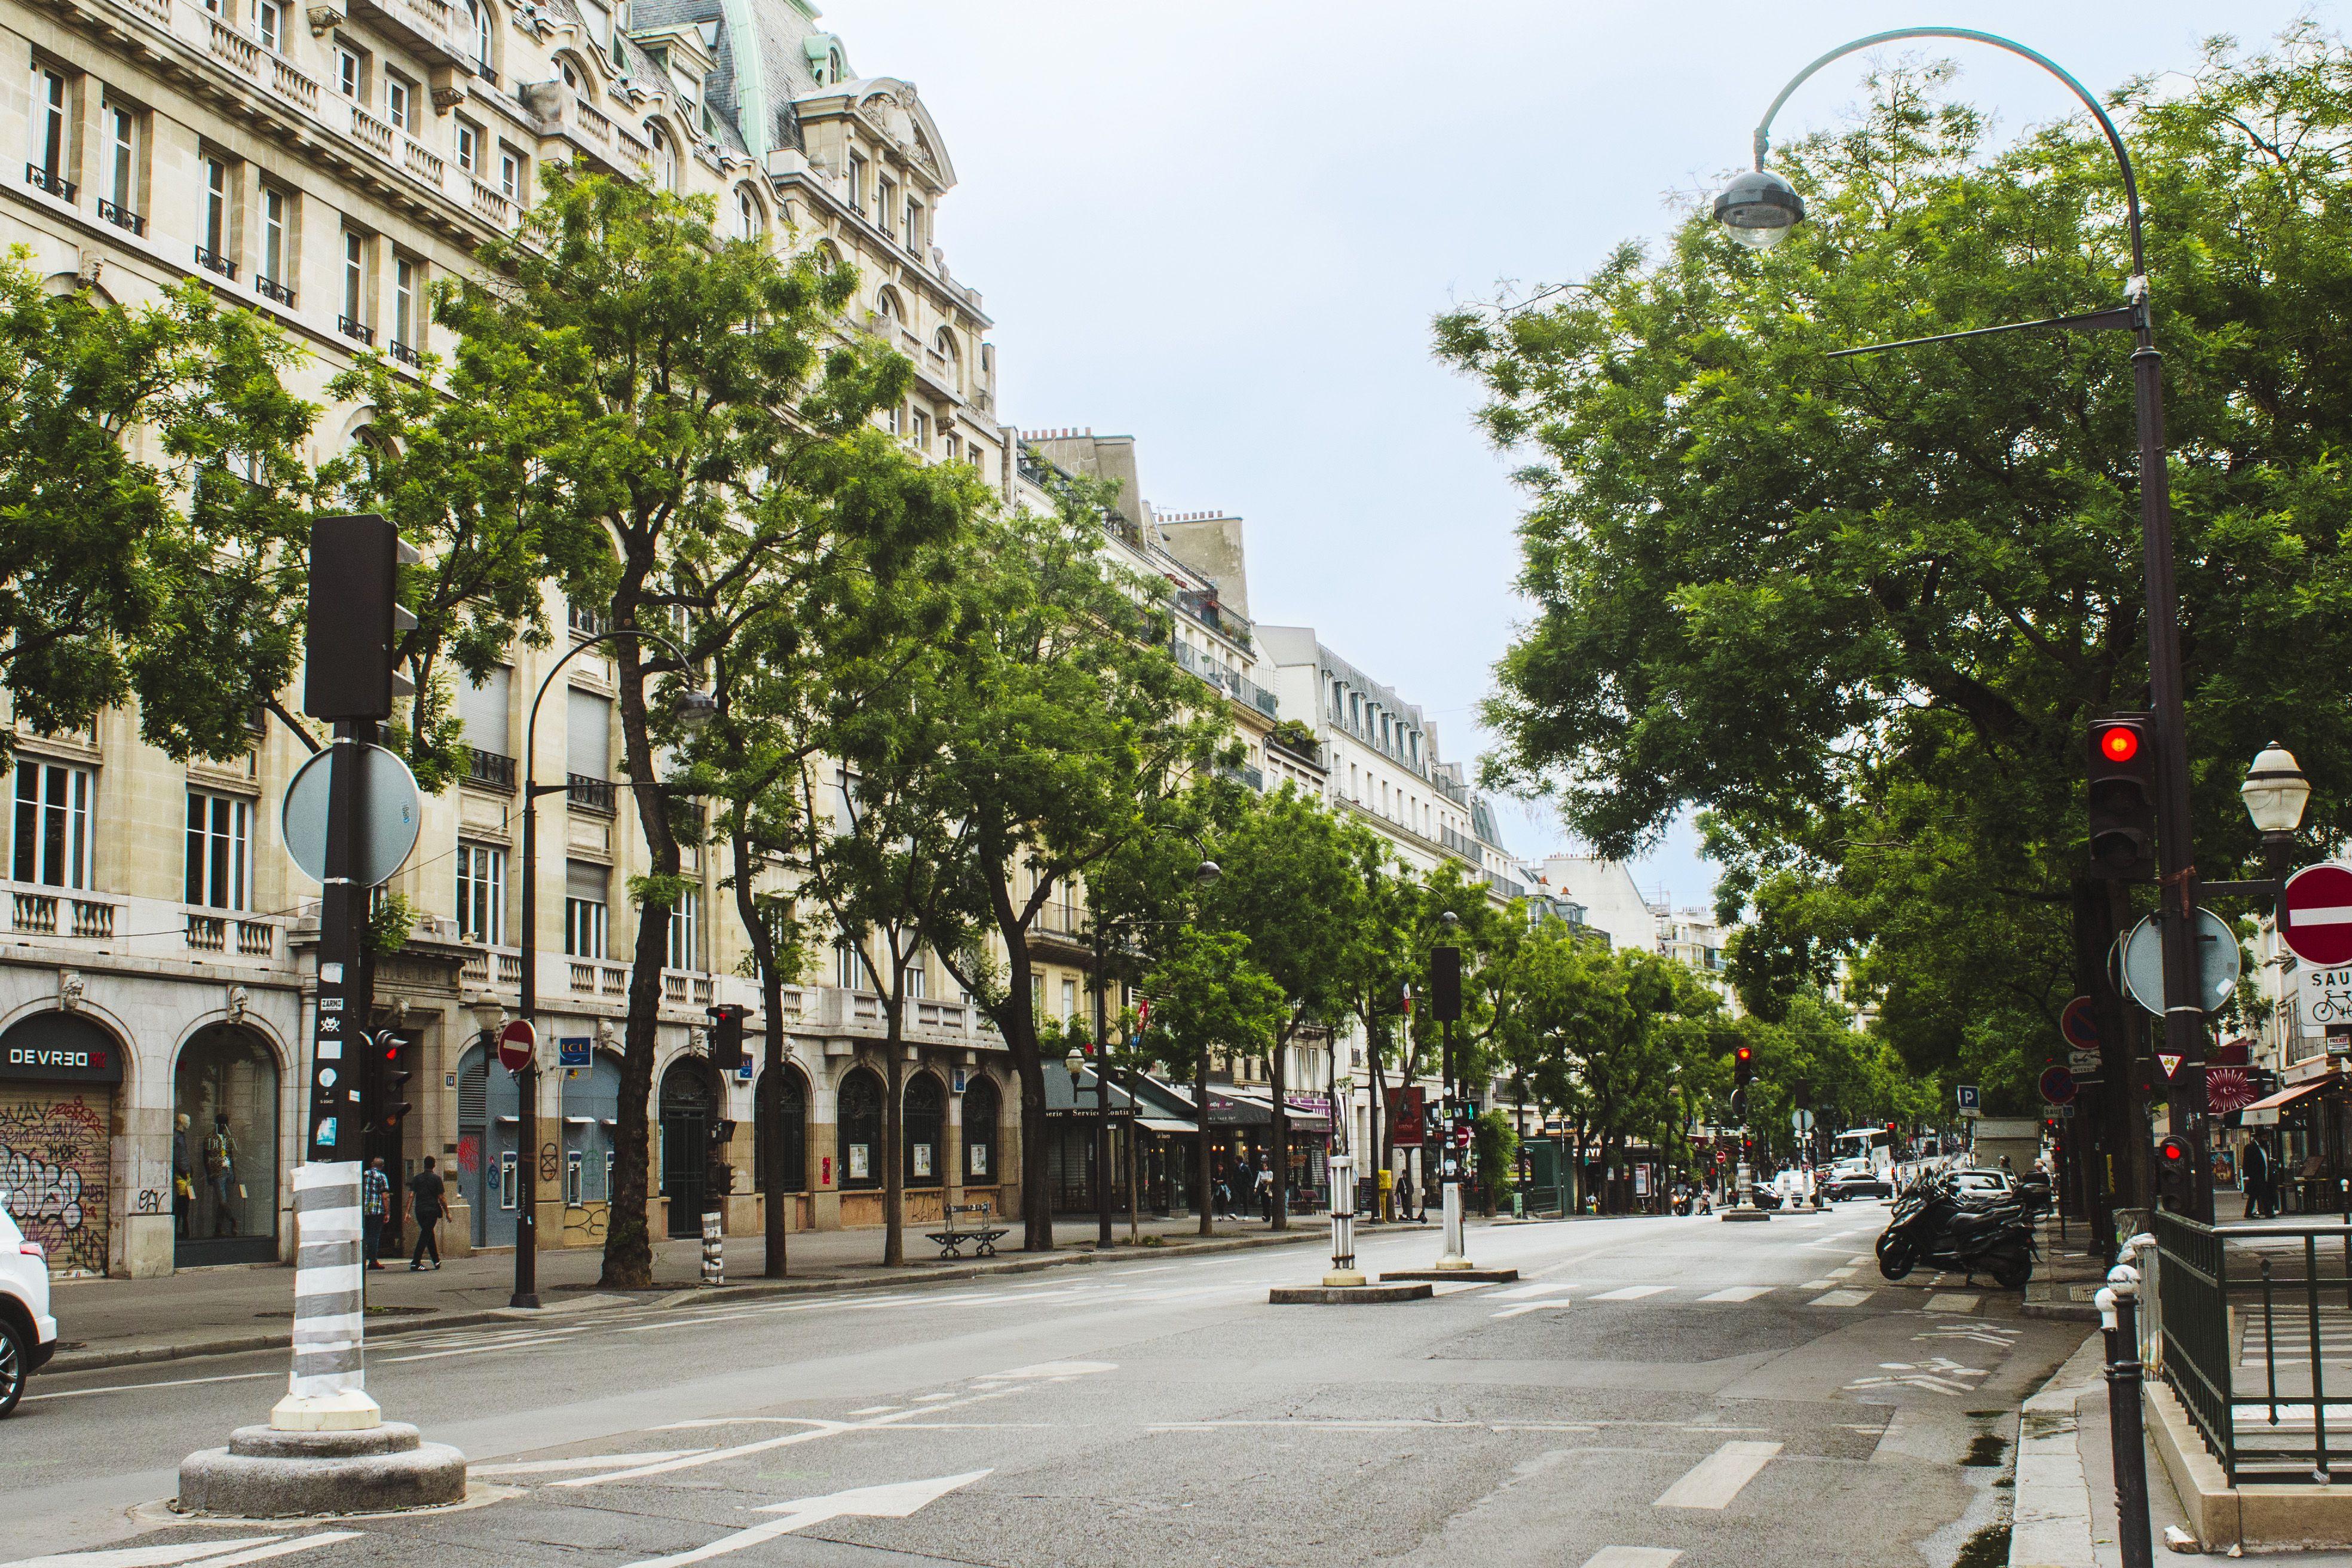 The Best Spots for Romantic Walks in Paris